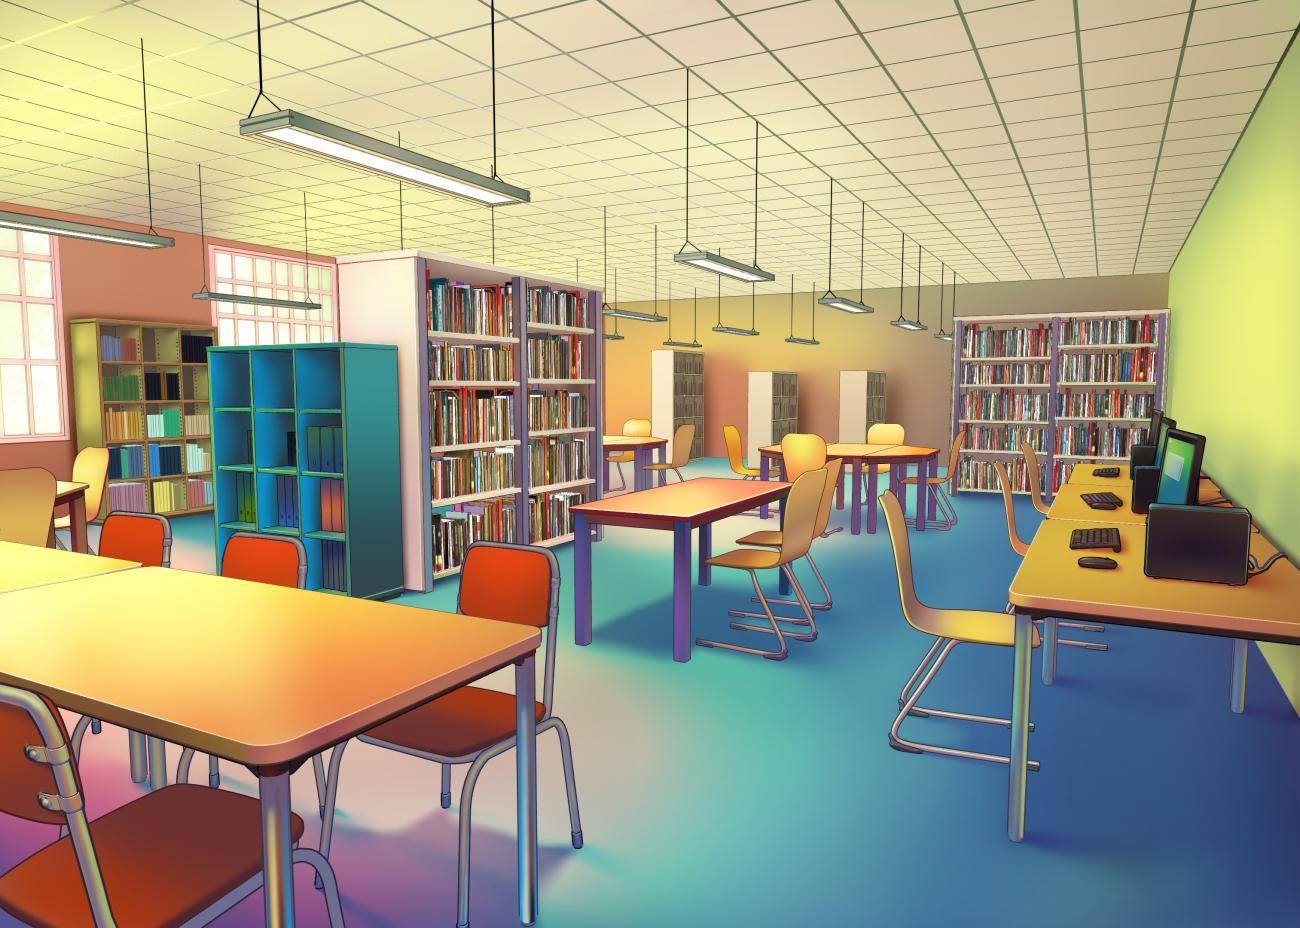 Biblioteca de Iwa - Página 3 C082653b0fe0768ff73978b7844195c4